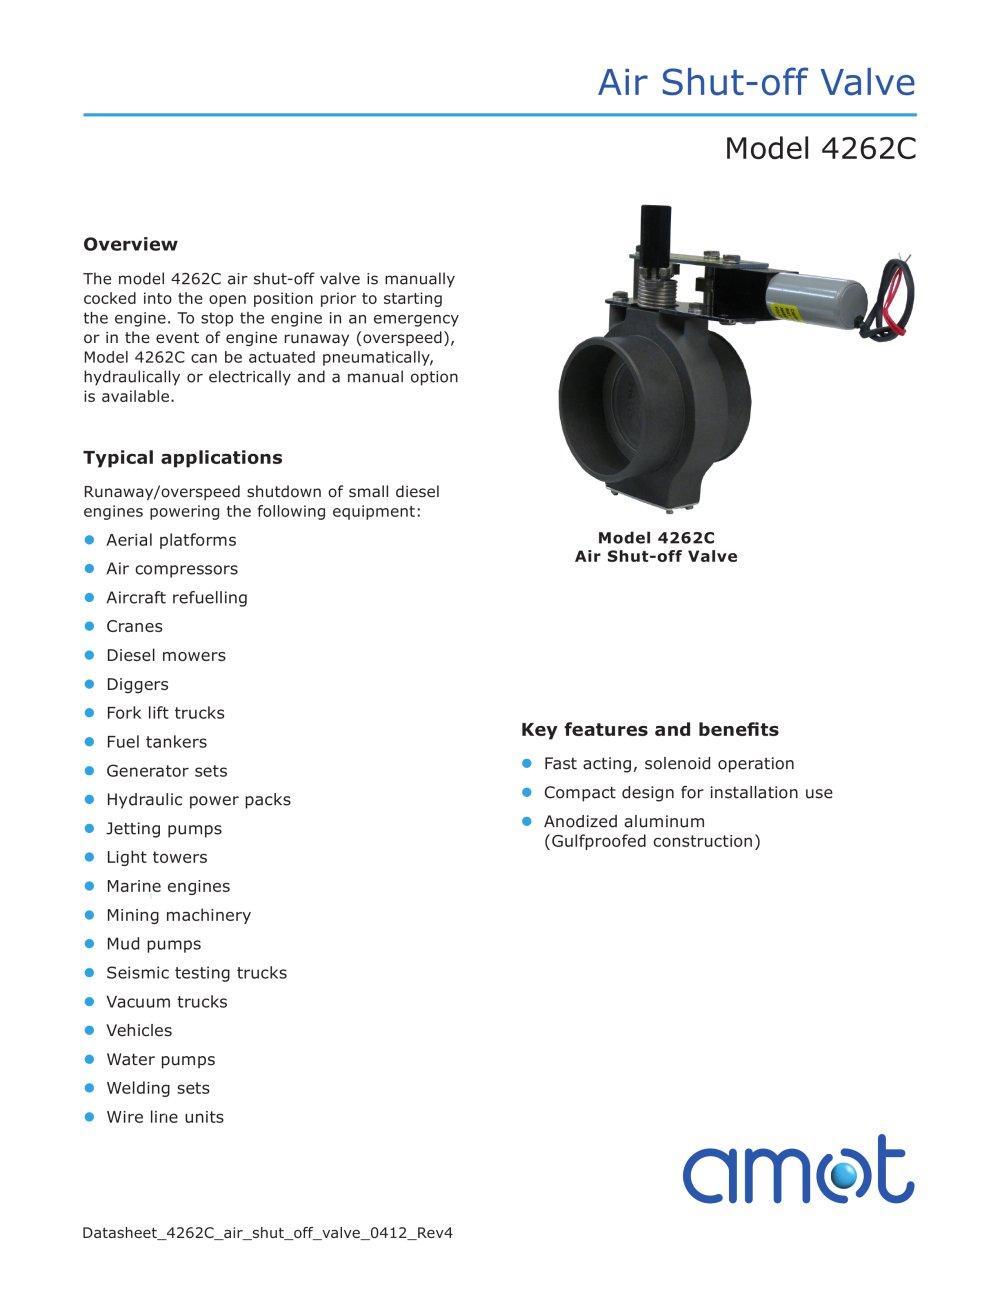 Intake Air Shutoff Valve - 1 / 4 Pages